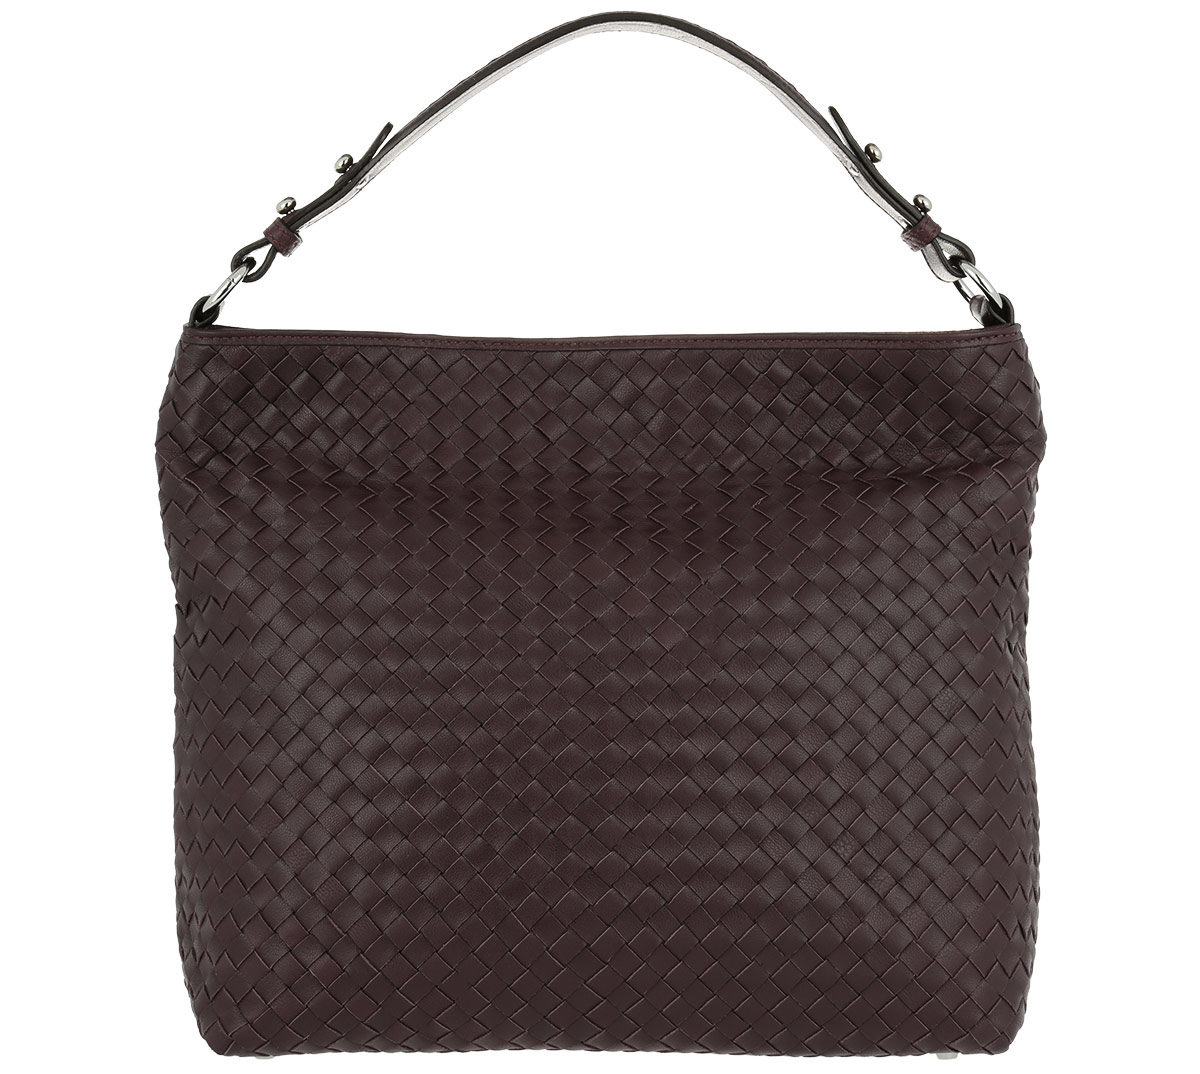 Abro PIUMA Hobo Bag aus geflochtenem Leder im BestCase Test